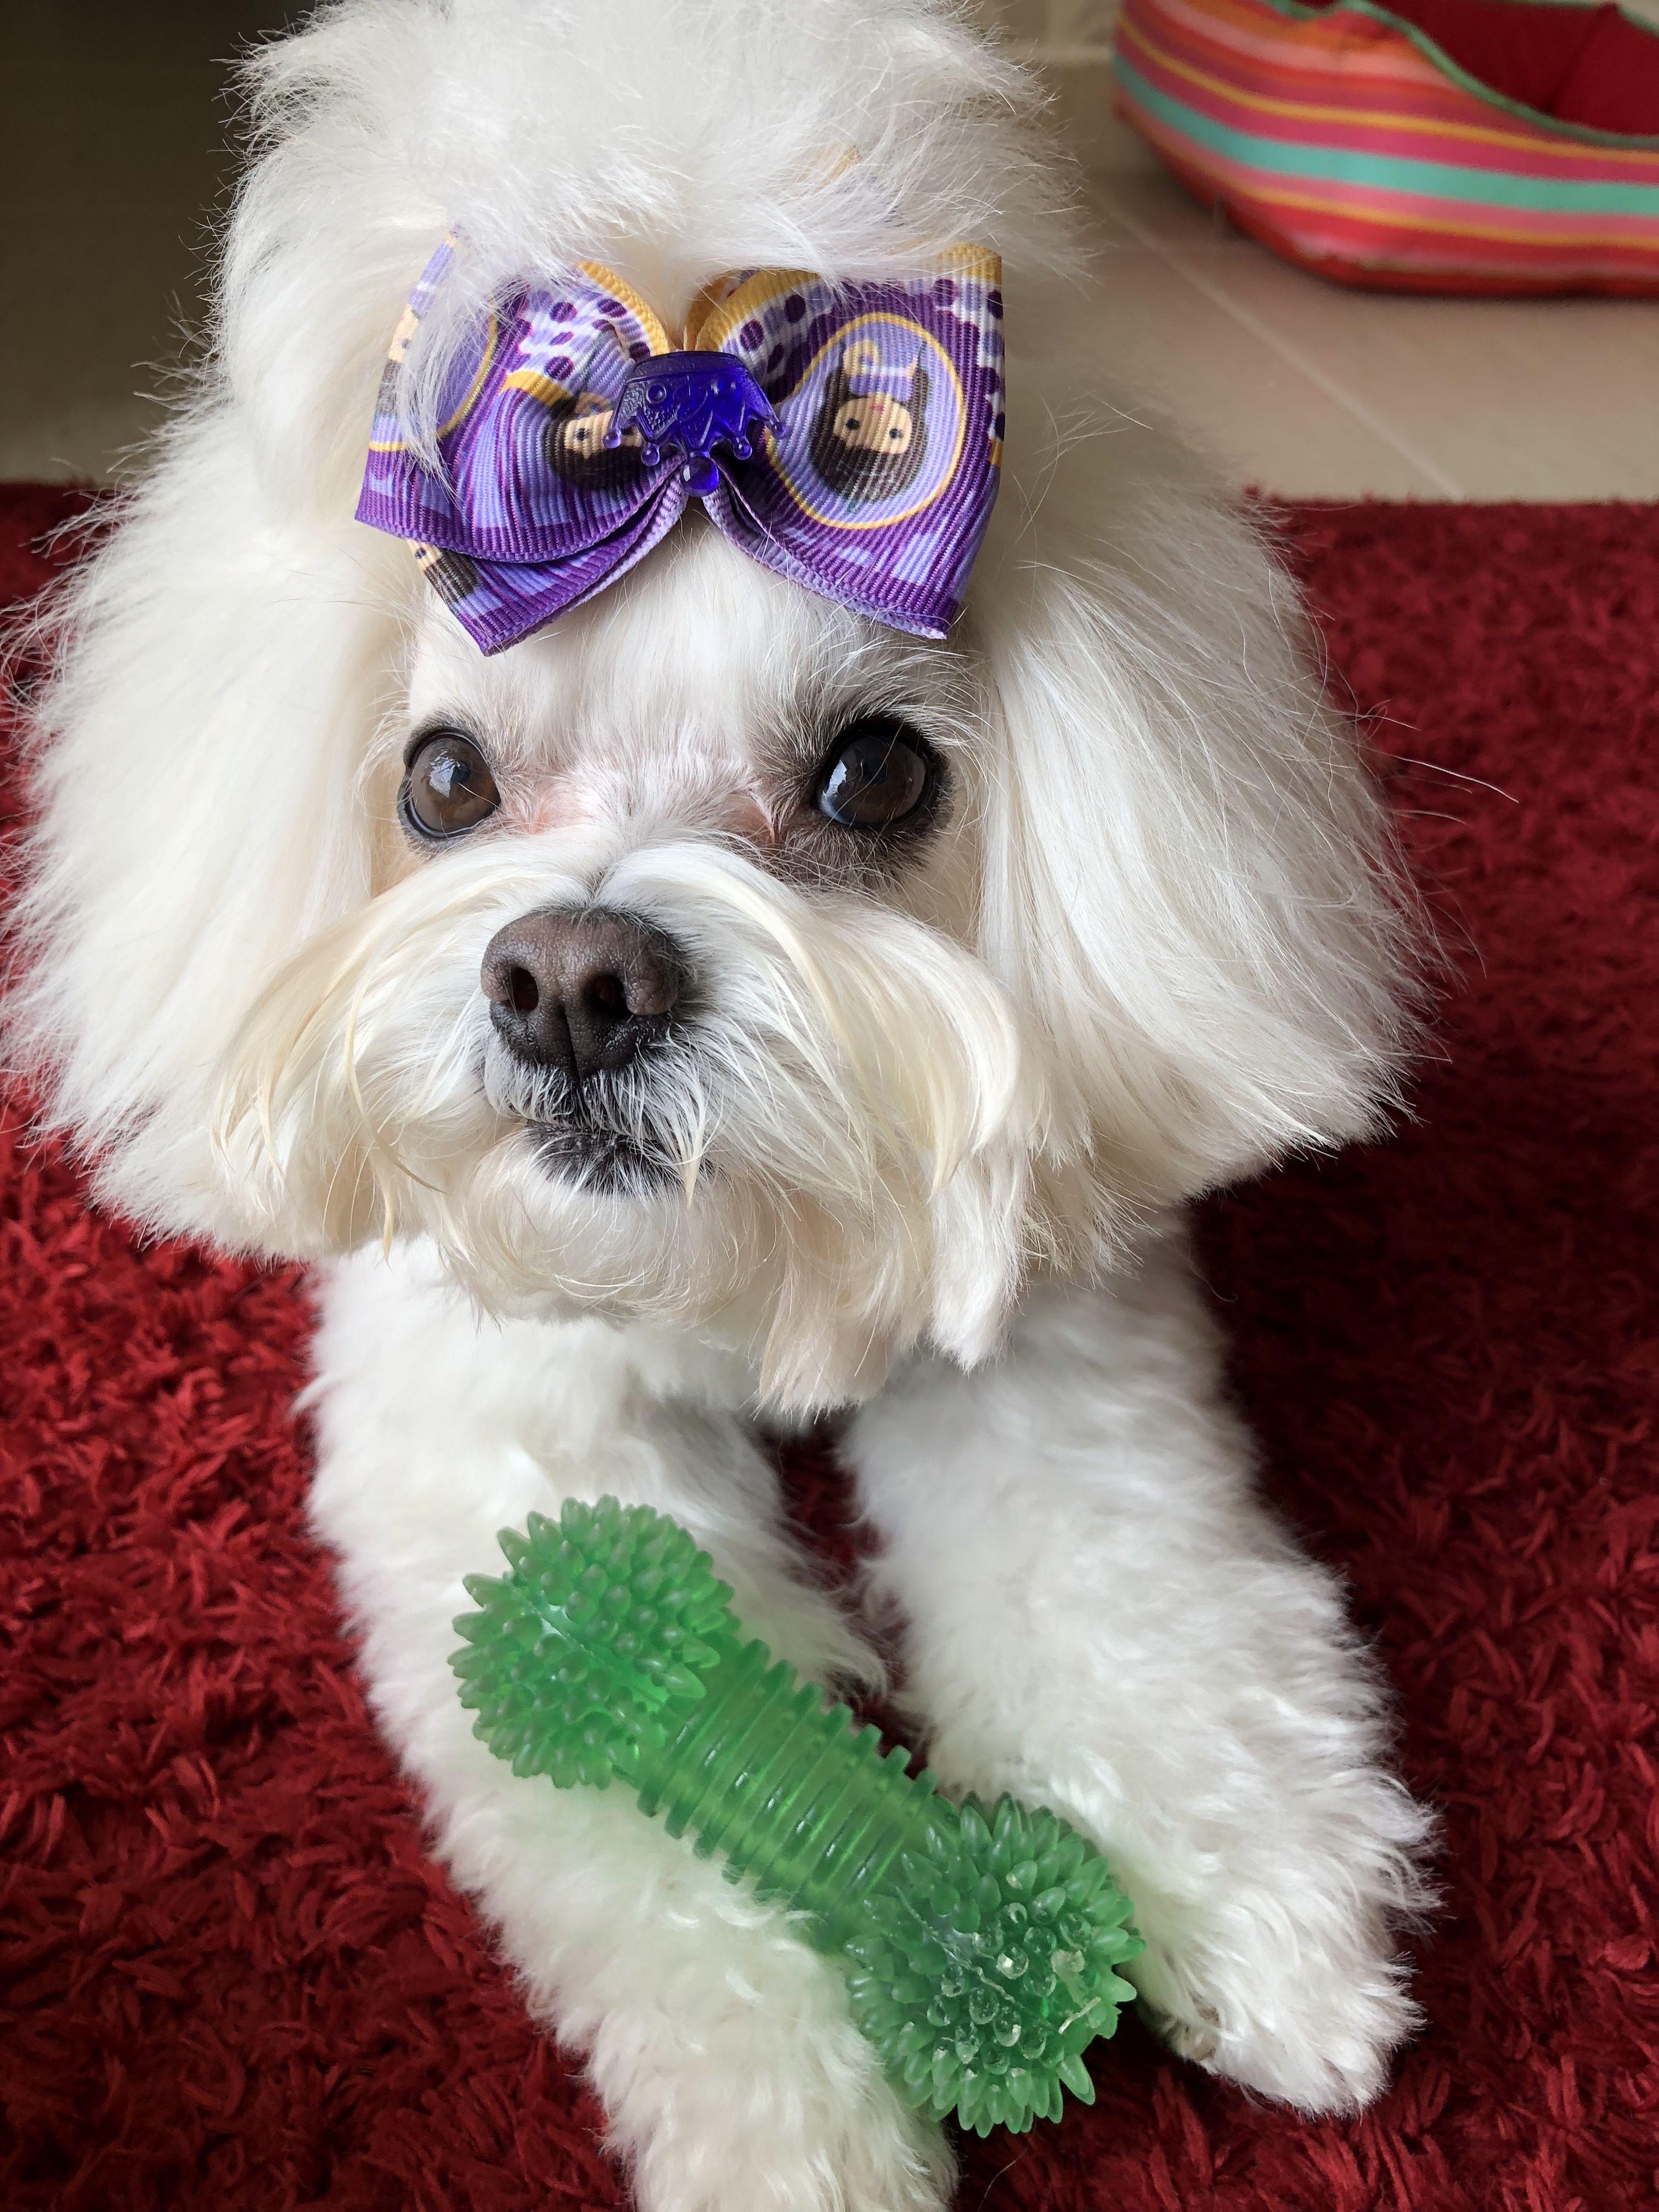 Maltese Omg Those Eyes Maltese Dogs Dog Cat